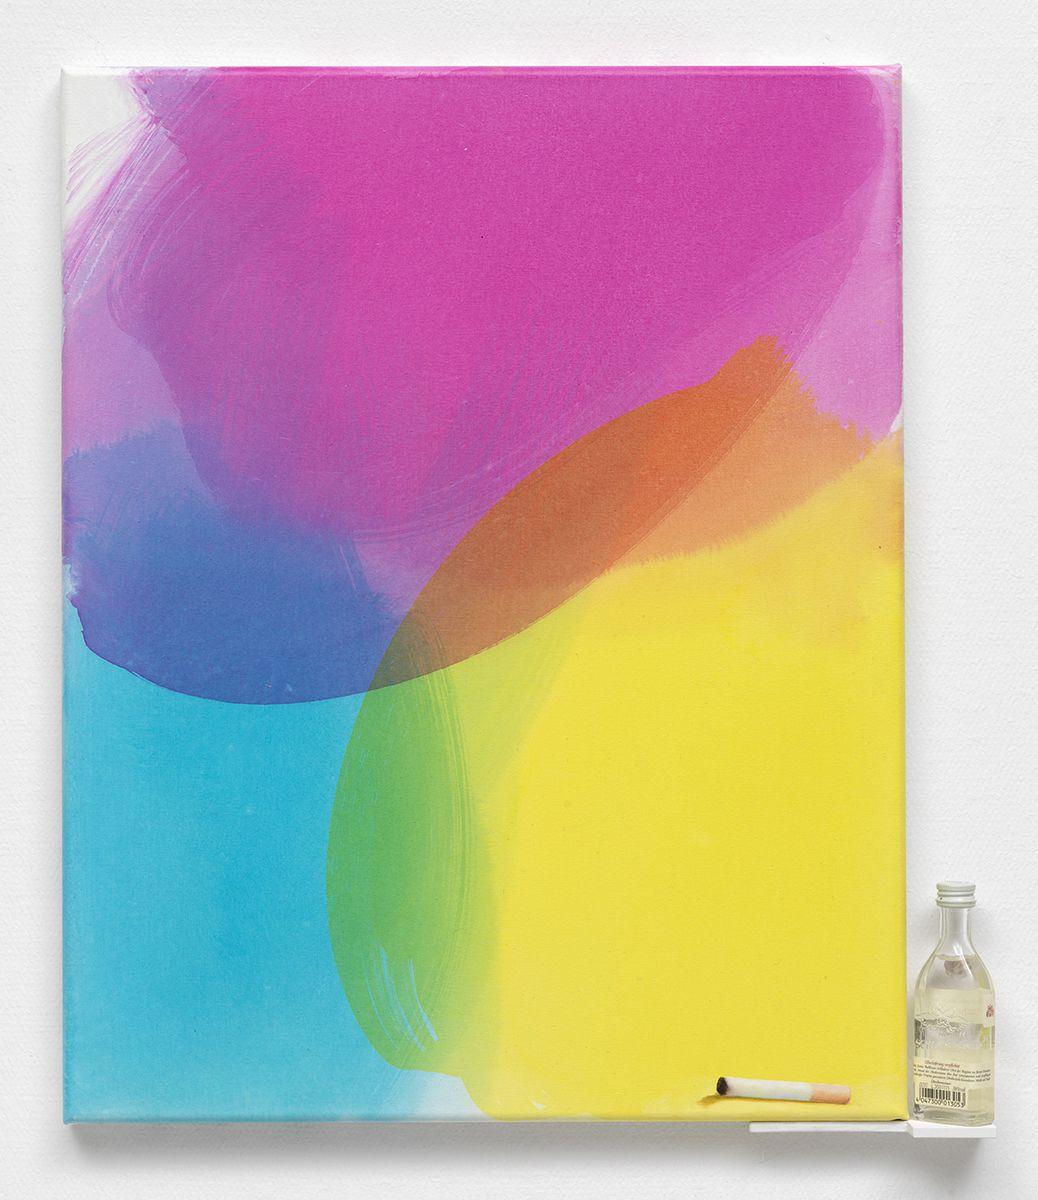 Monika Baer Ohne Titel, 2016 Acrylic on canvas, wood, bottle 15 3/4 x 11 3/4 inches (40 x 30 cm)